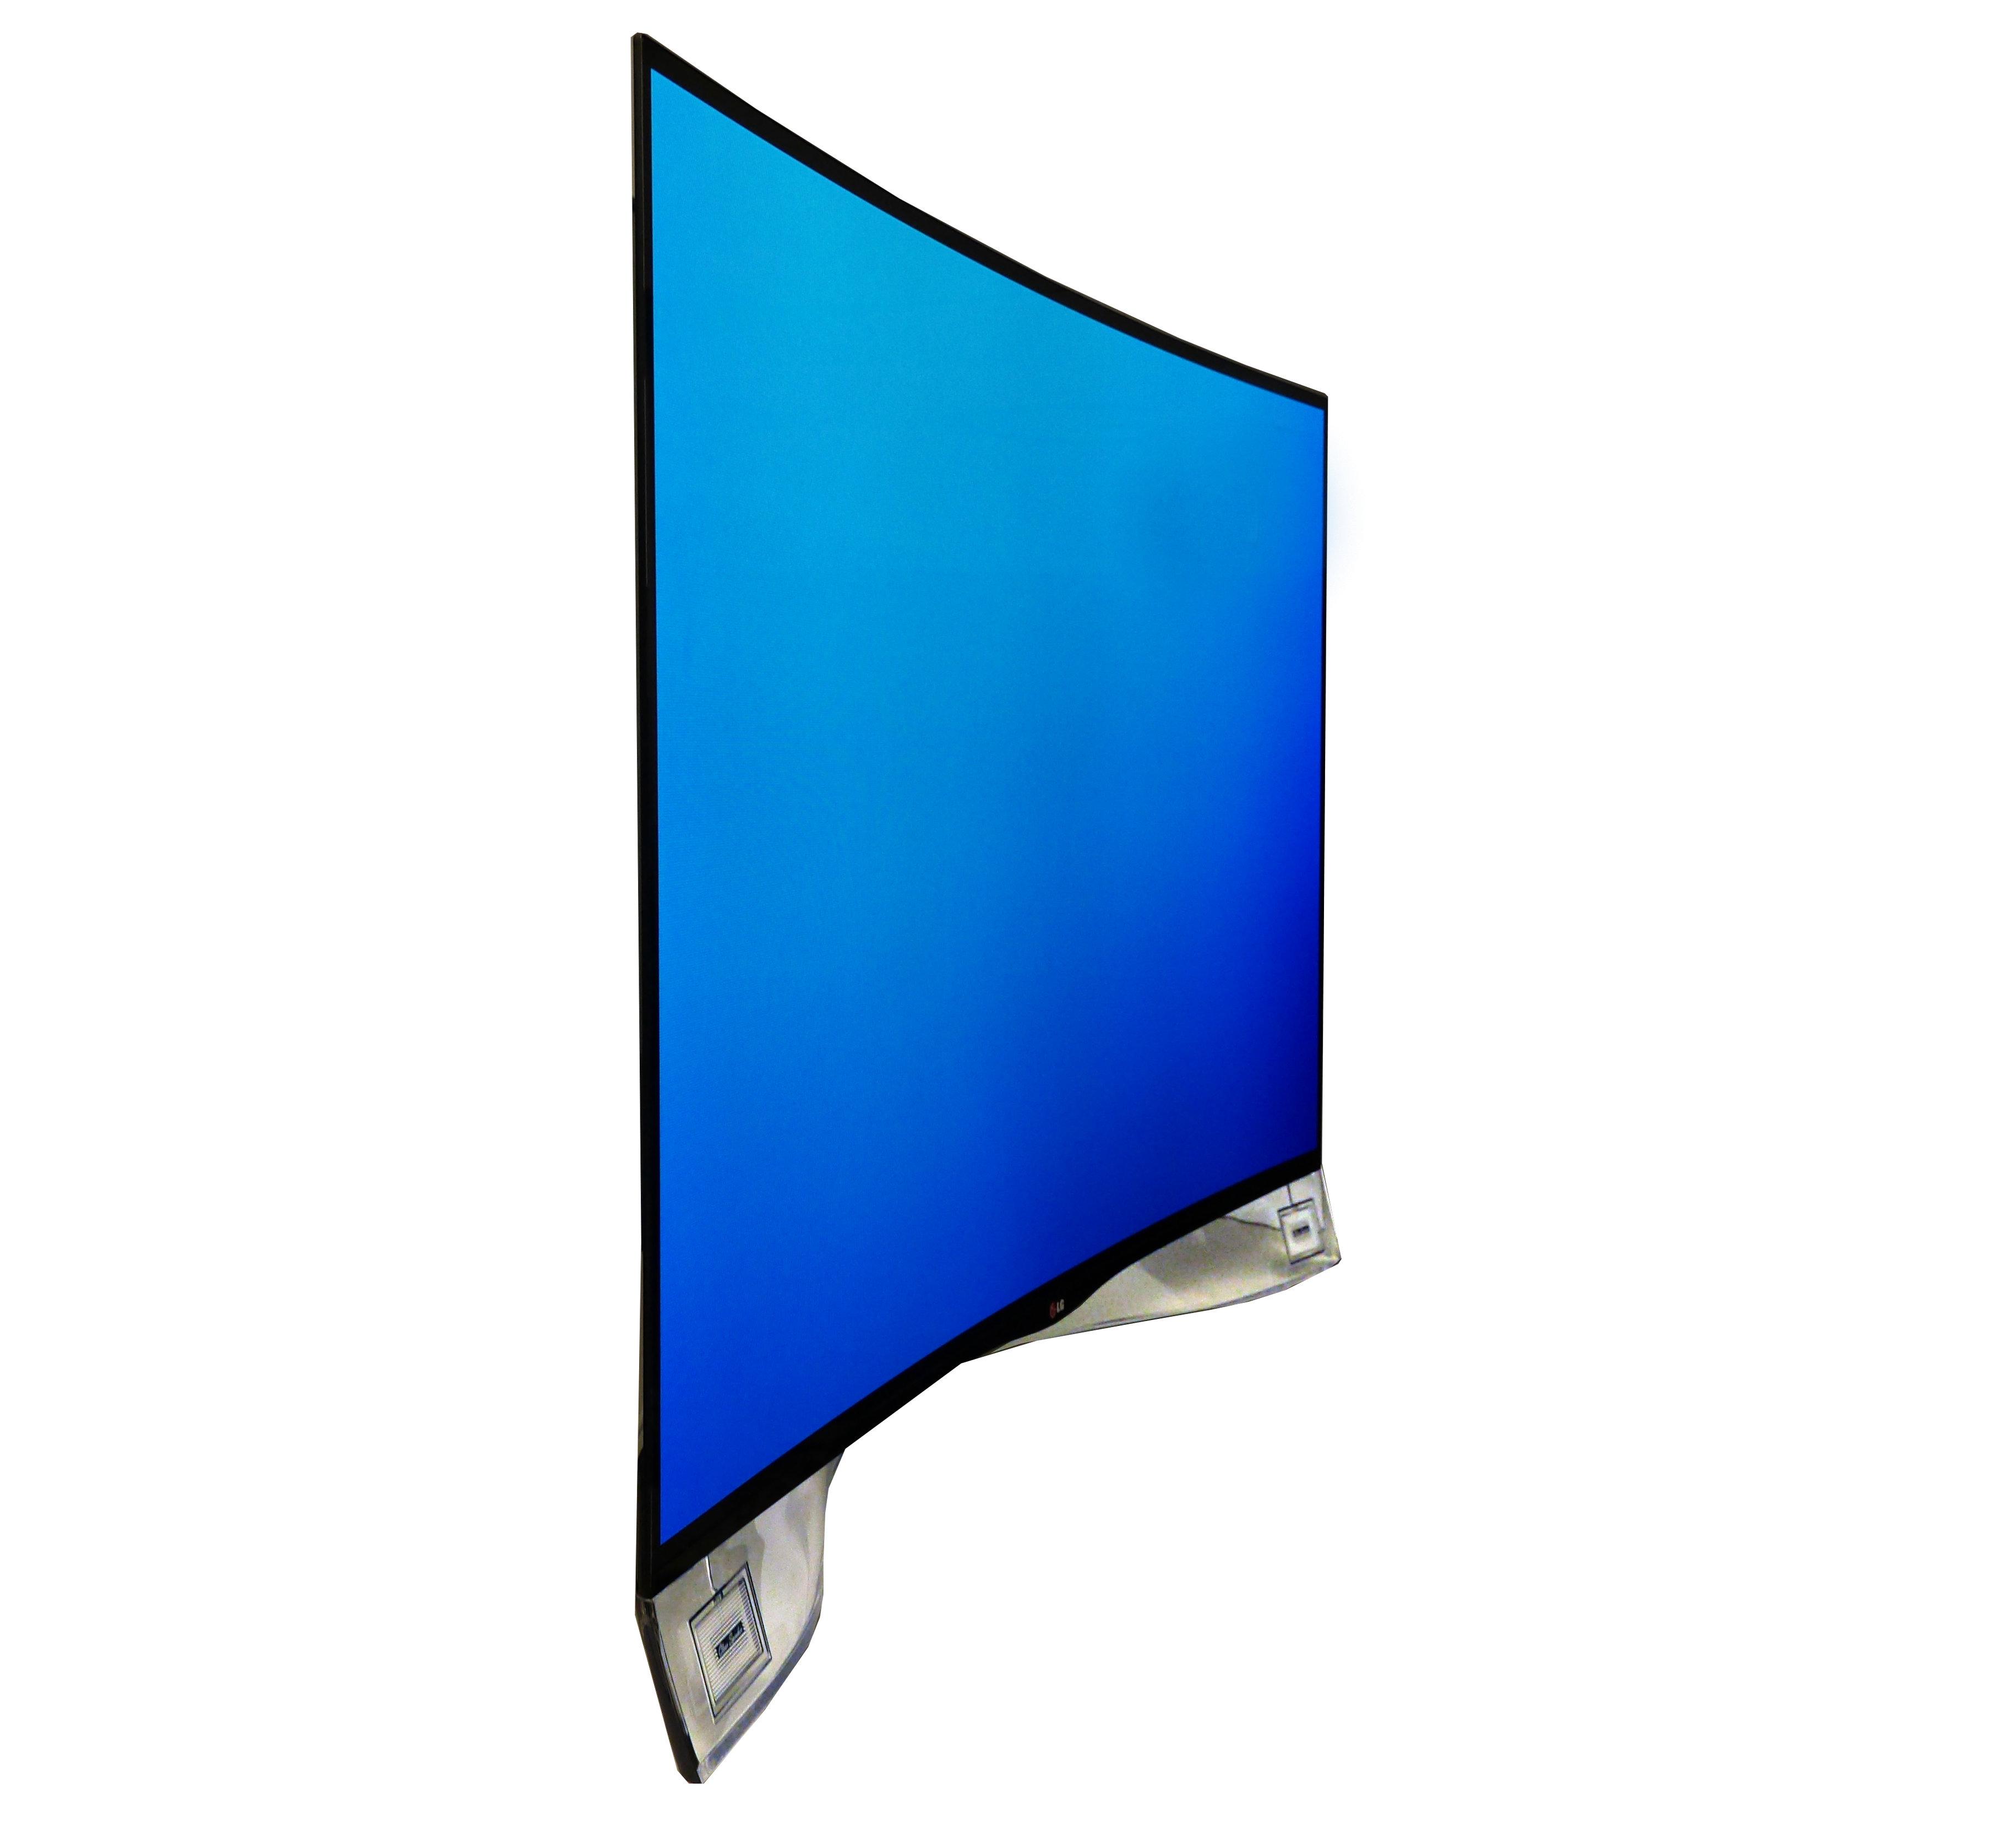 55EA9809 CURVED TV | 'S WERELDS 1ste | LG …